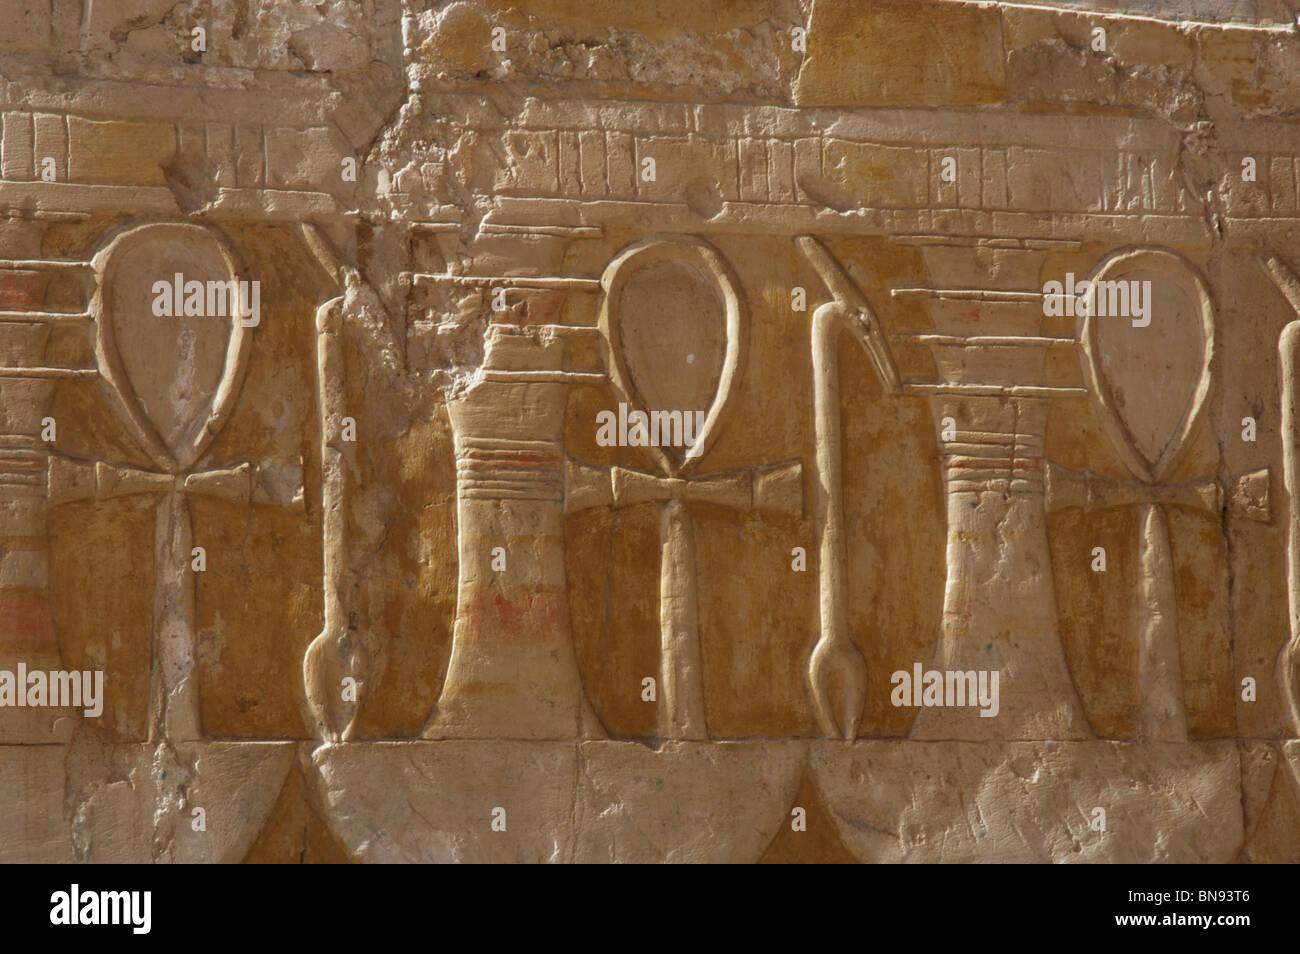 Ancient Egyptian Hieroglyphics Alphabet  Free Art Lessons